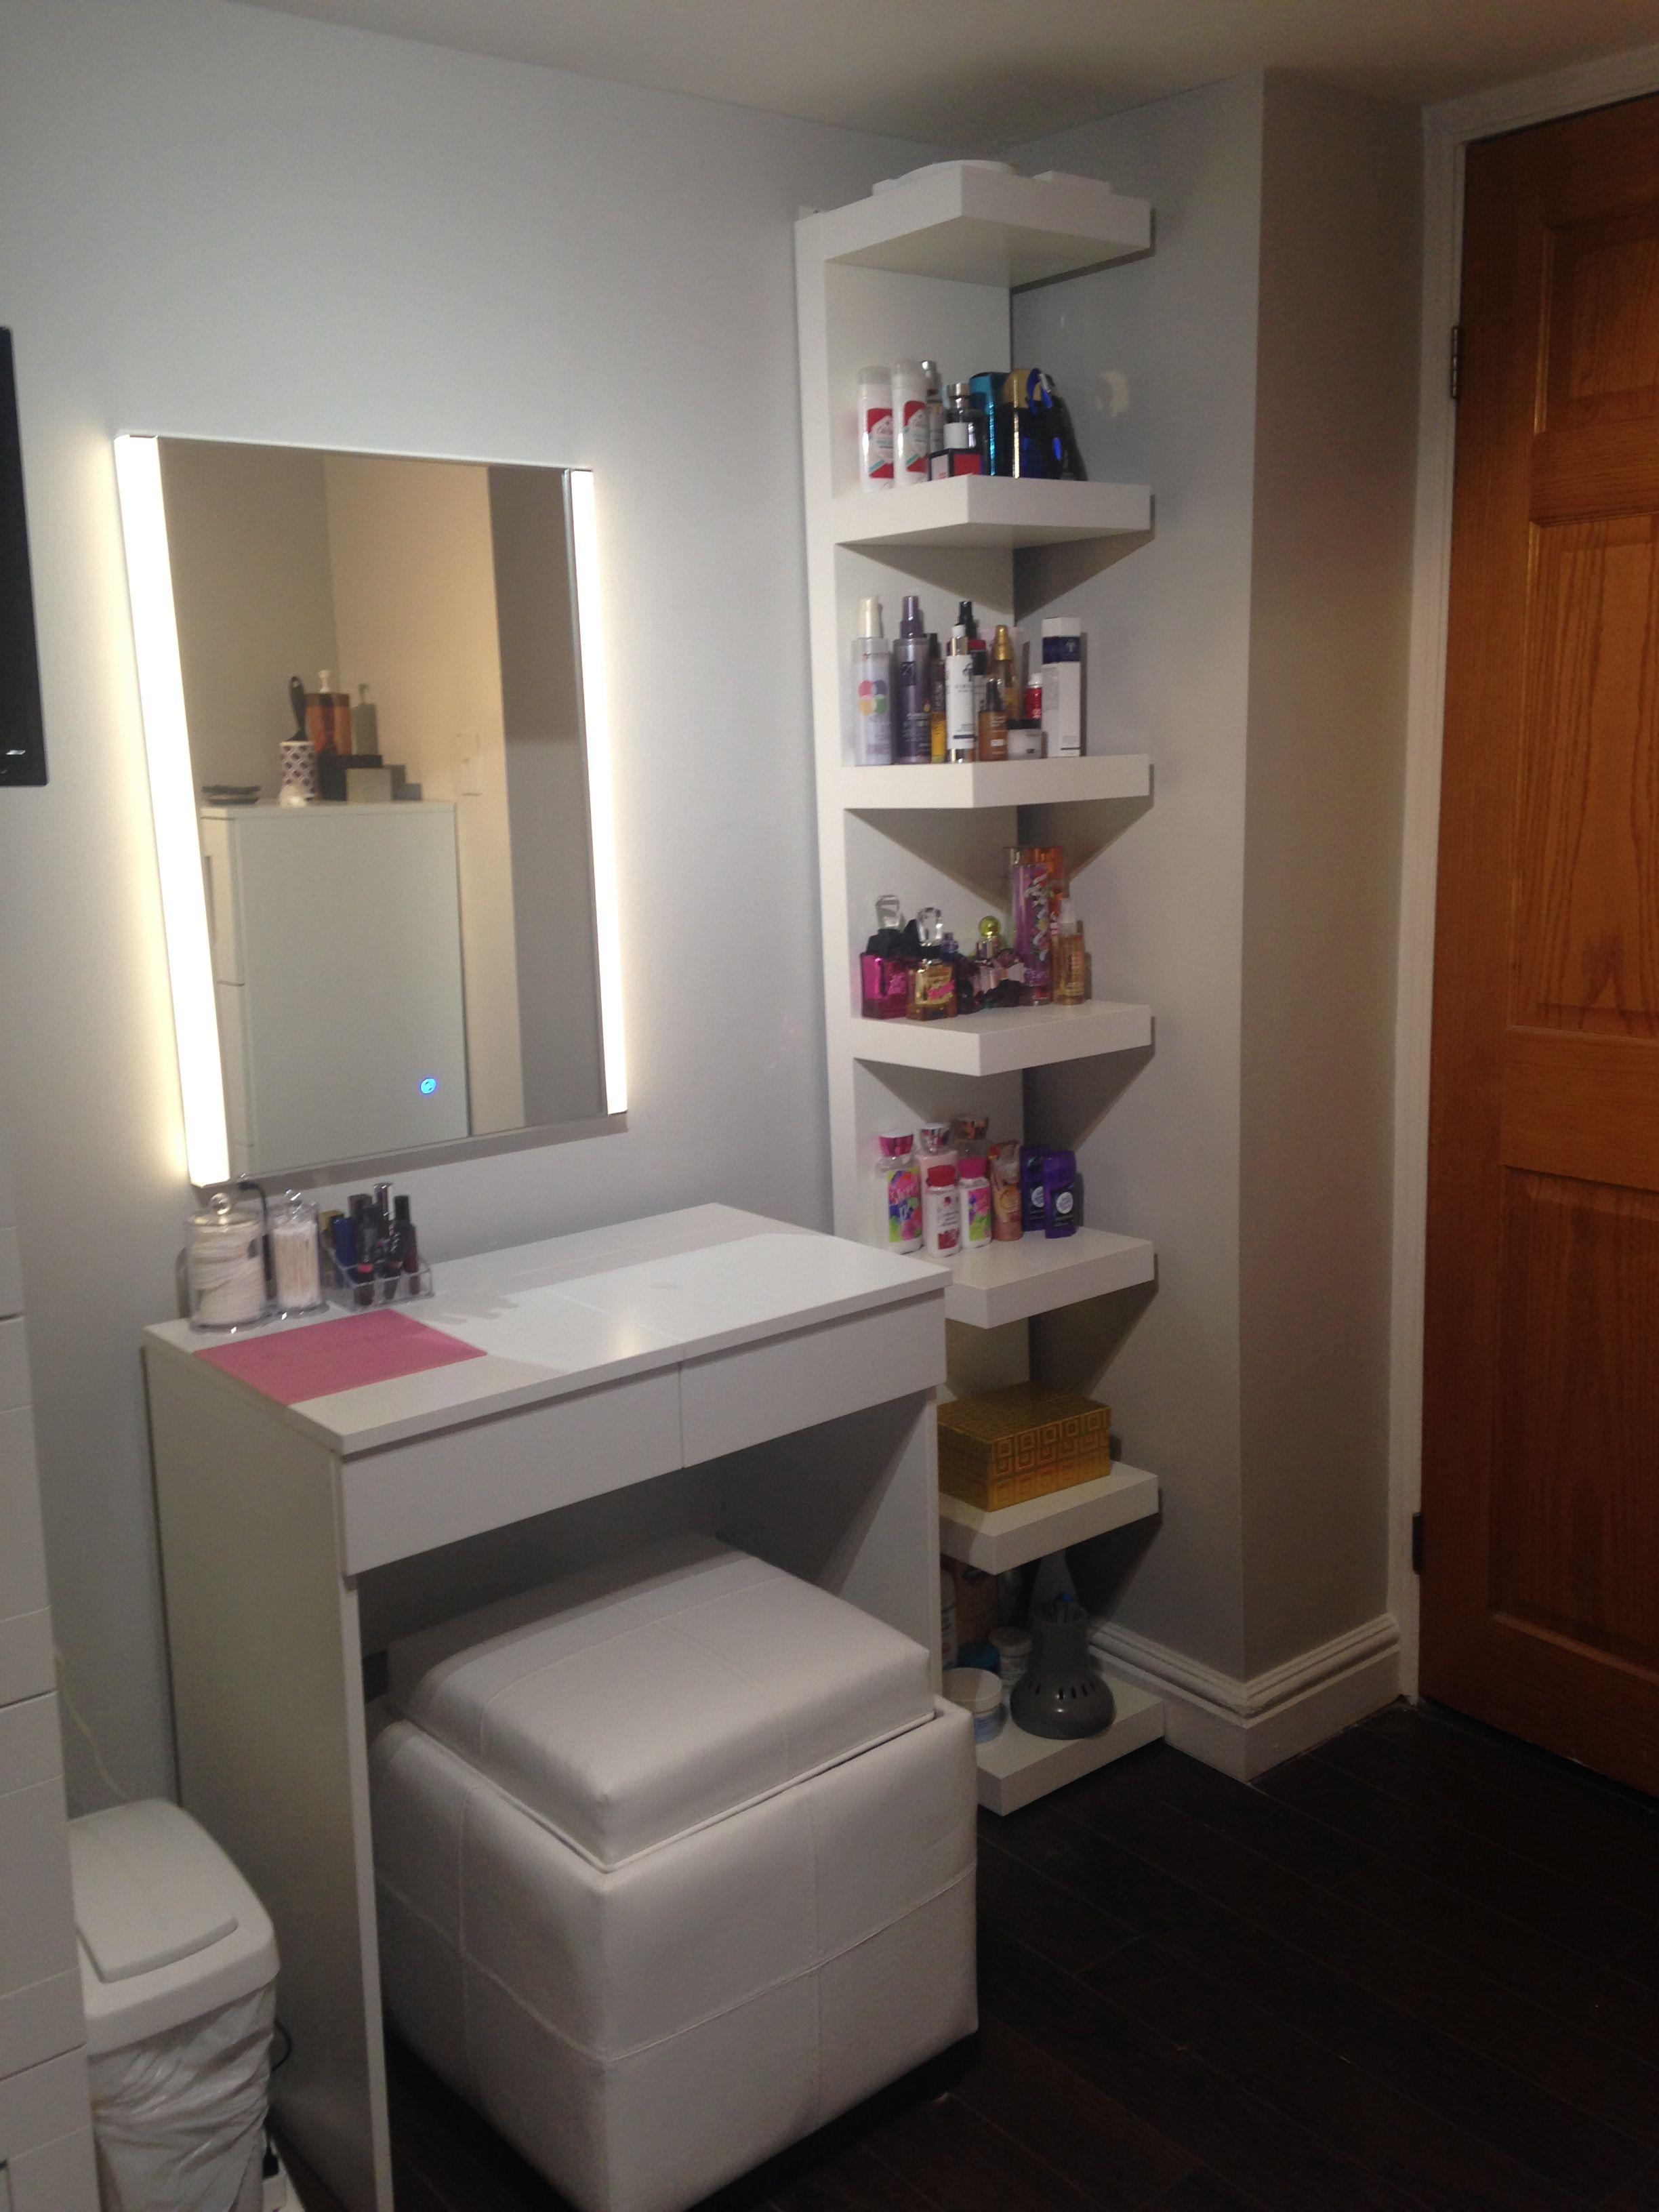 Makeup Vanity Ikea Brimnes Dressing Table Ikea Lack Shelf Home